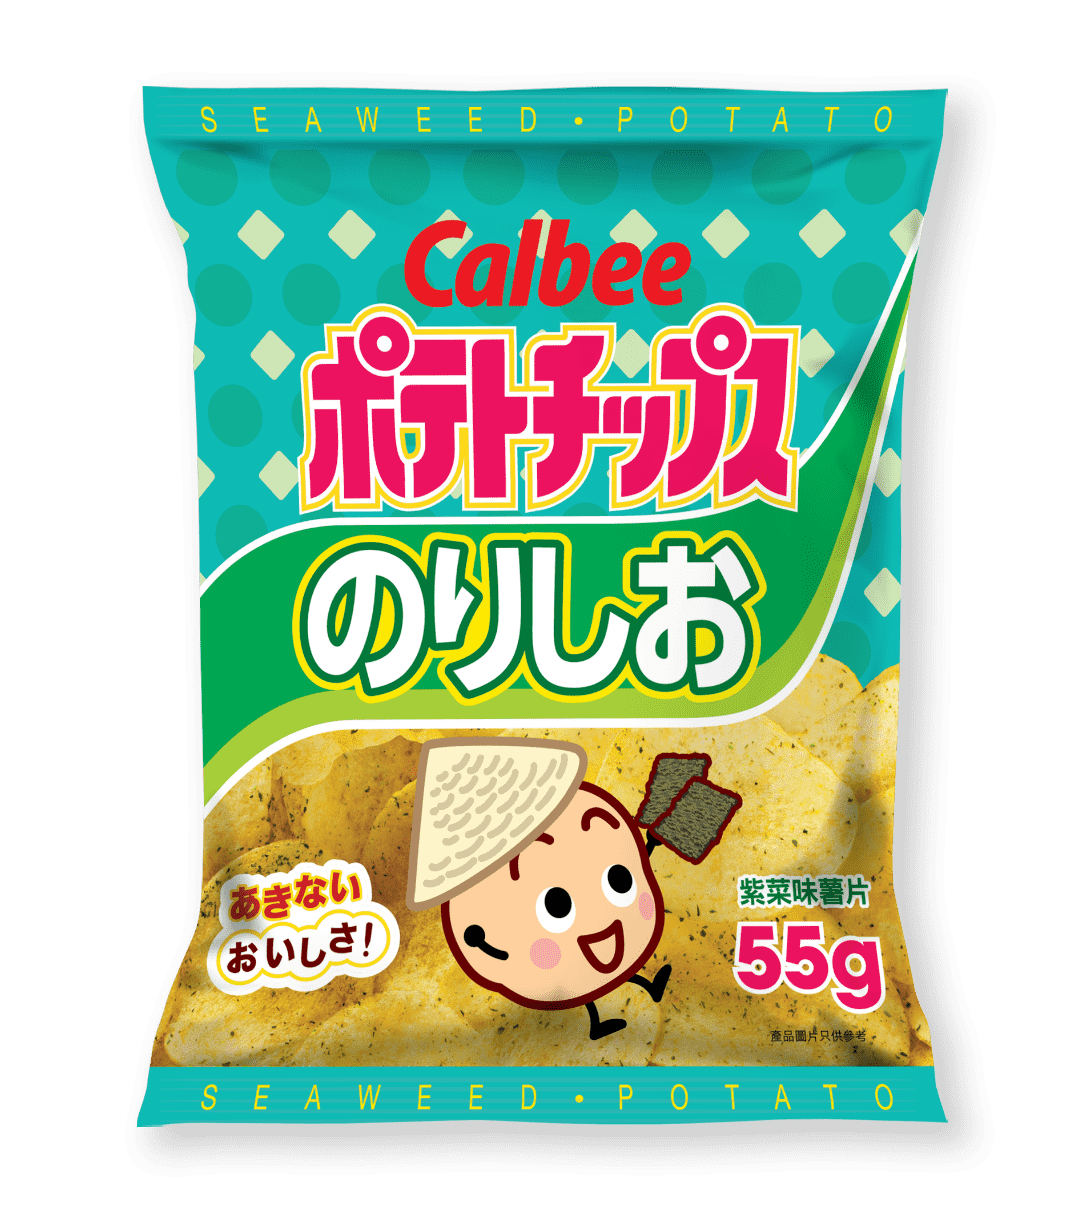 Calbee Australia - World Foods - Potato Chips - Seaweed